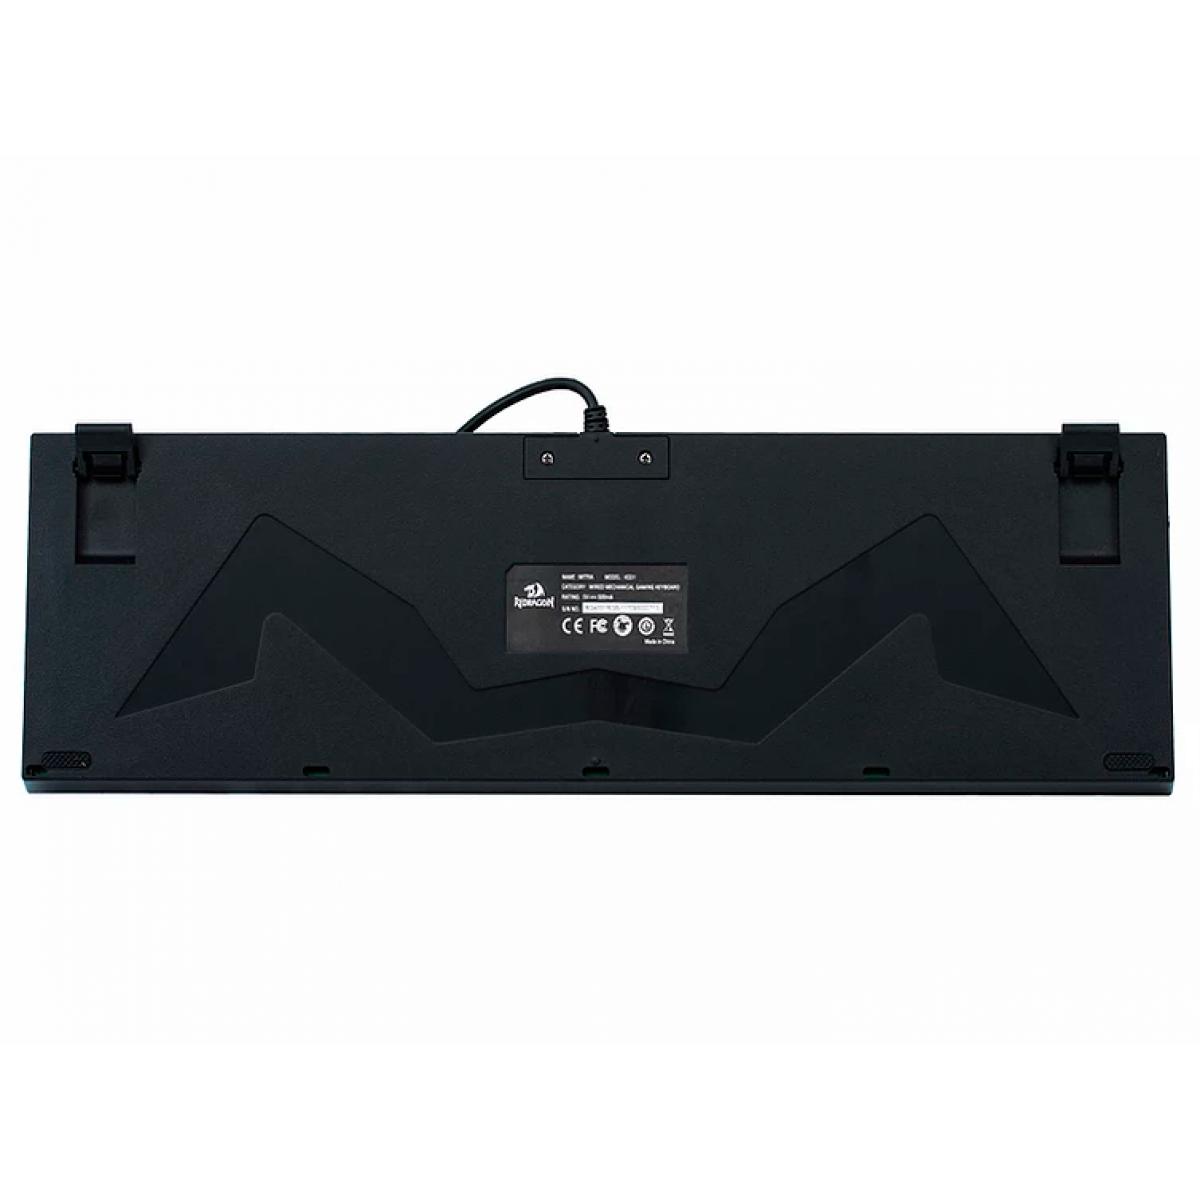 Teclado Mecânico Gamer Redragon Mitra, Single Color, Switch Brown, ABNT2, K551-1-PT-BROWN